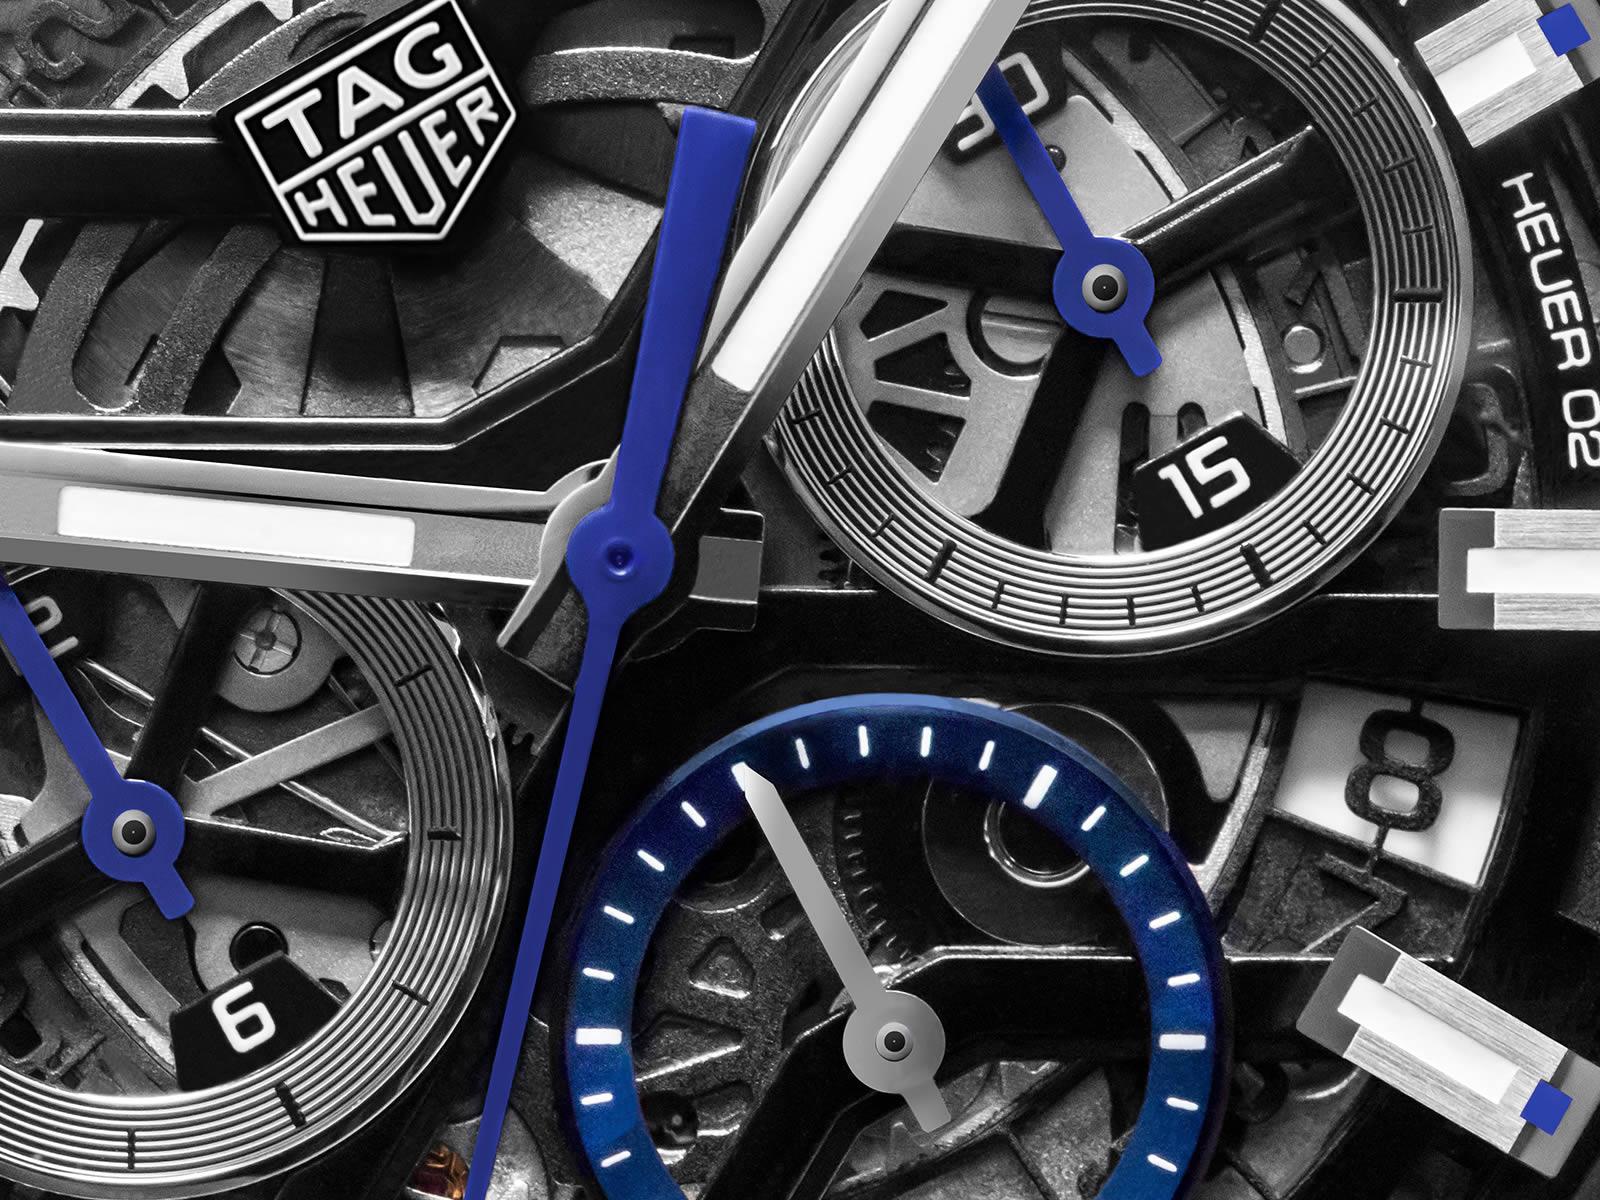 cbg2017-ft6143-tag-heuer-carrera-calibre-heuer02-automatic-chronograph-43-mm-3-.jpg